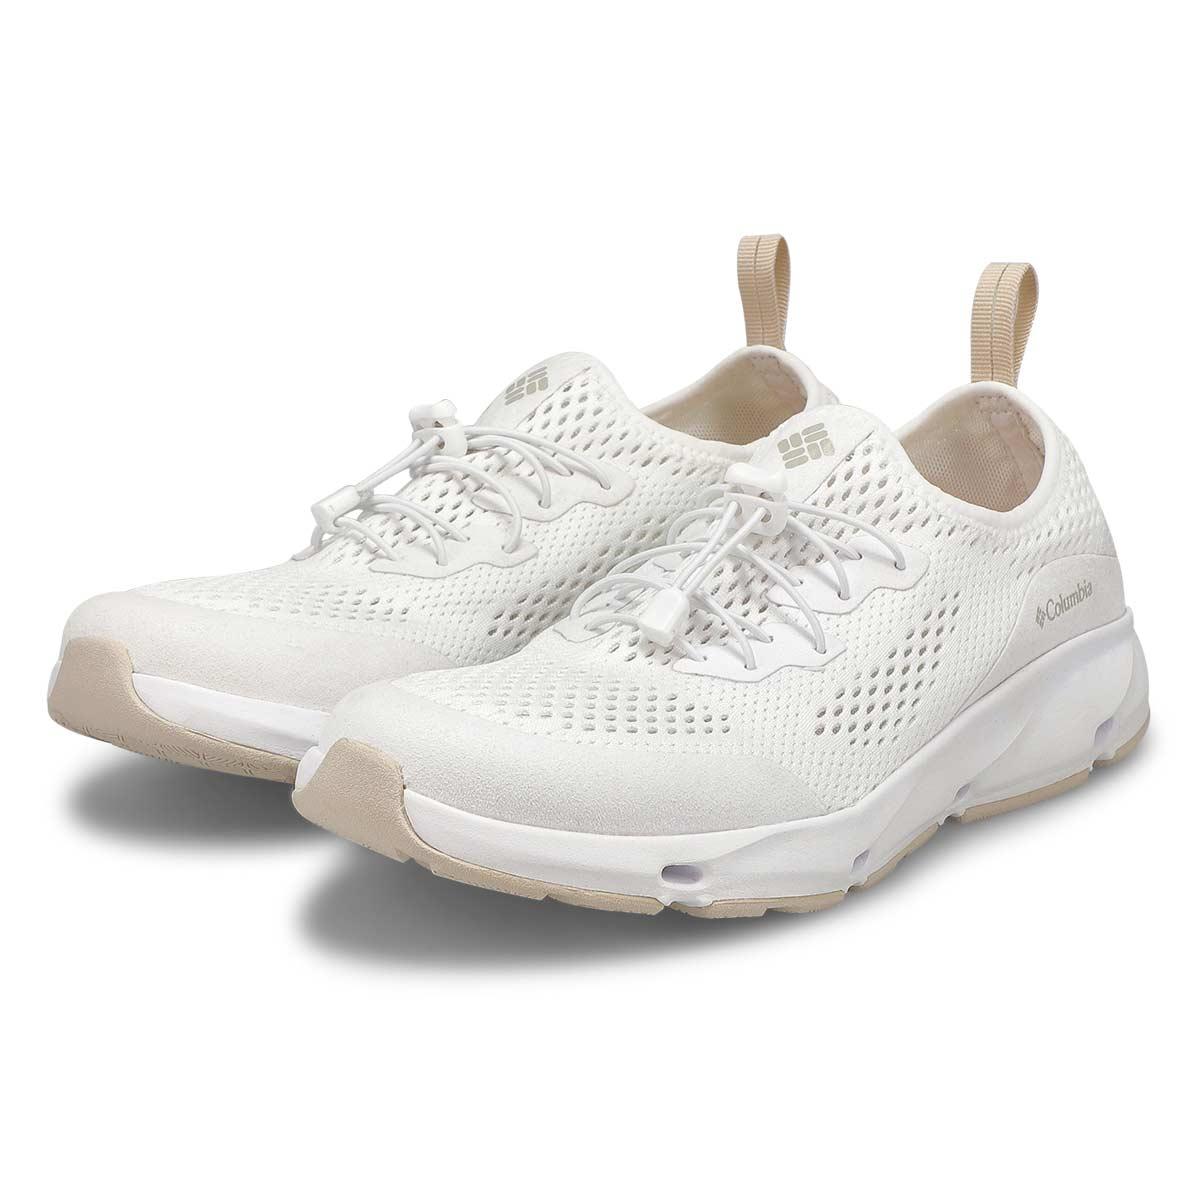 Women's Columbia Vent  Sneaker - White